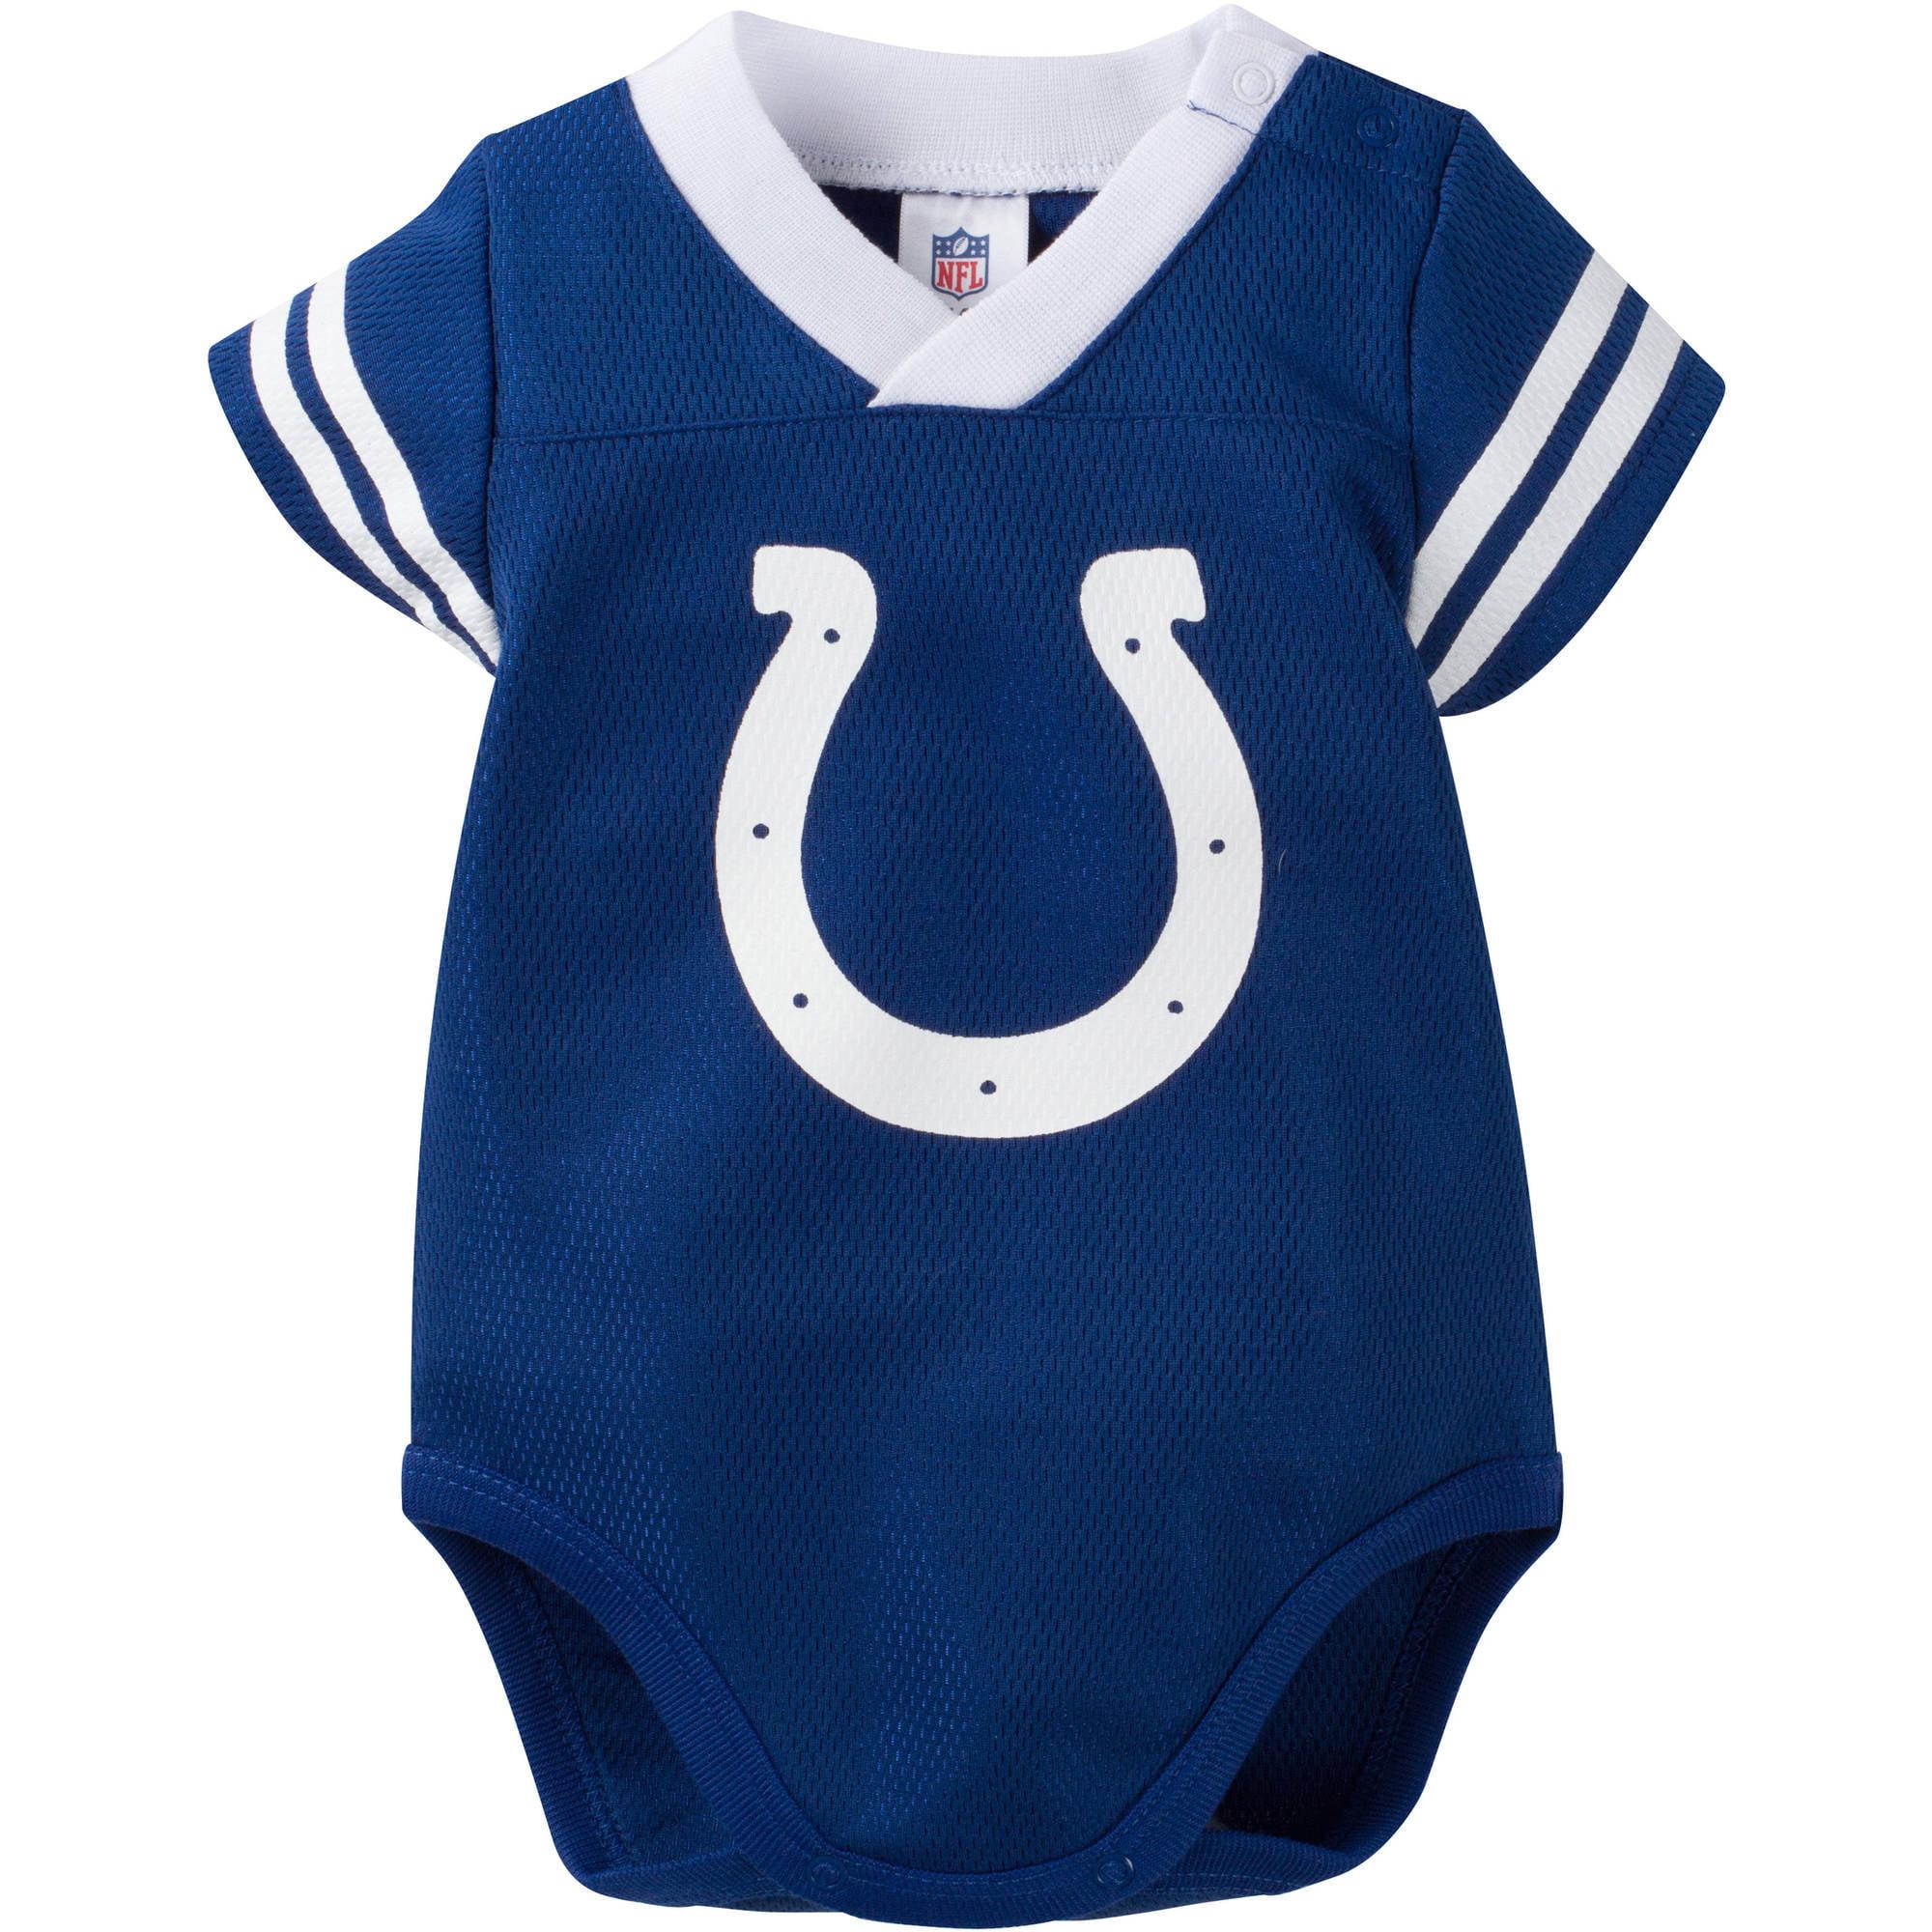 NFL Indianapolis Colts Baby Boys Mesh Dazzle Bodysuit